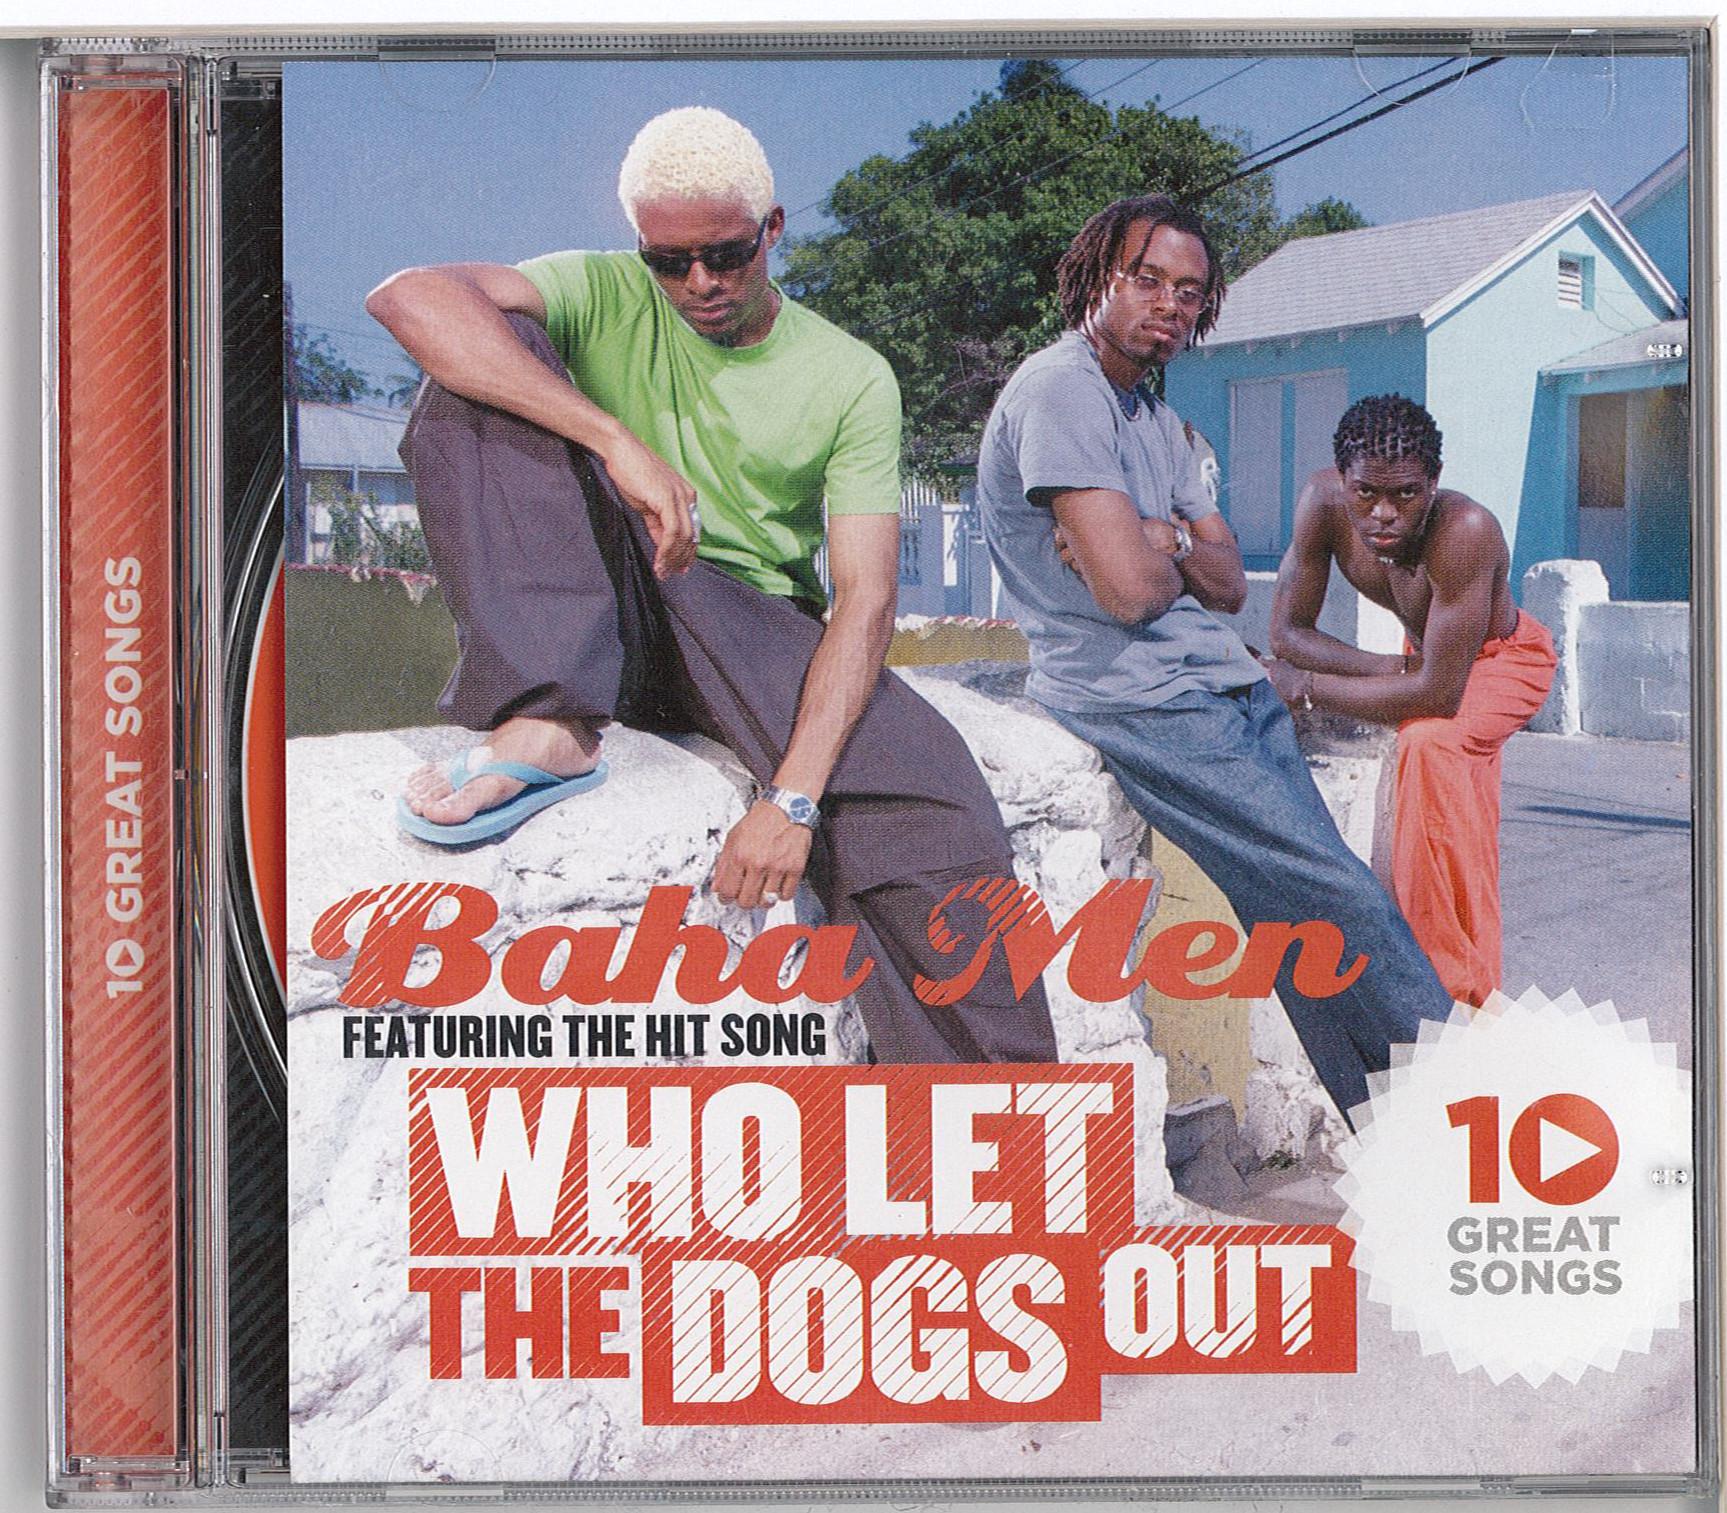 WLWLTDOO-2010-CD-BAHA-MEN-10-GREAT-SONGS-FRONT.jpg